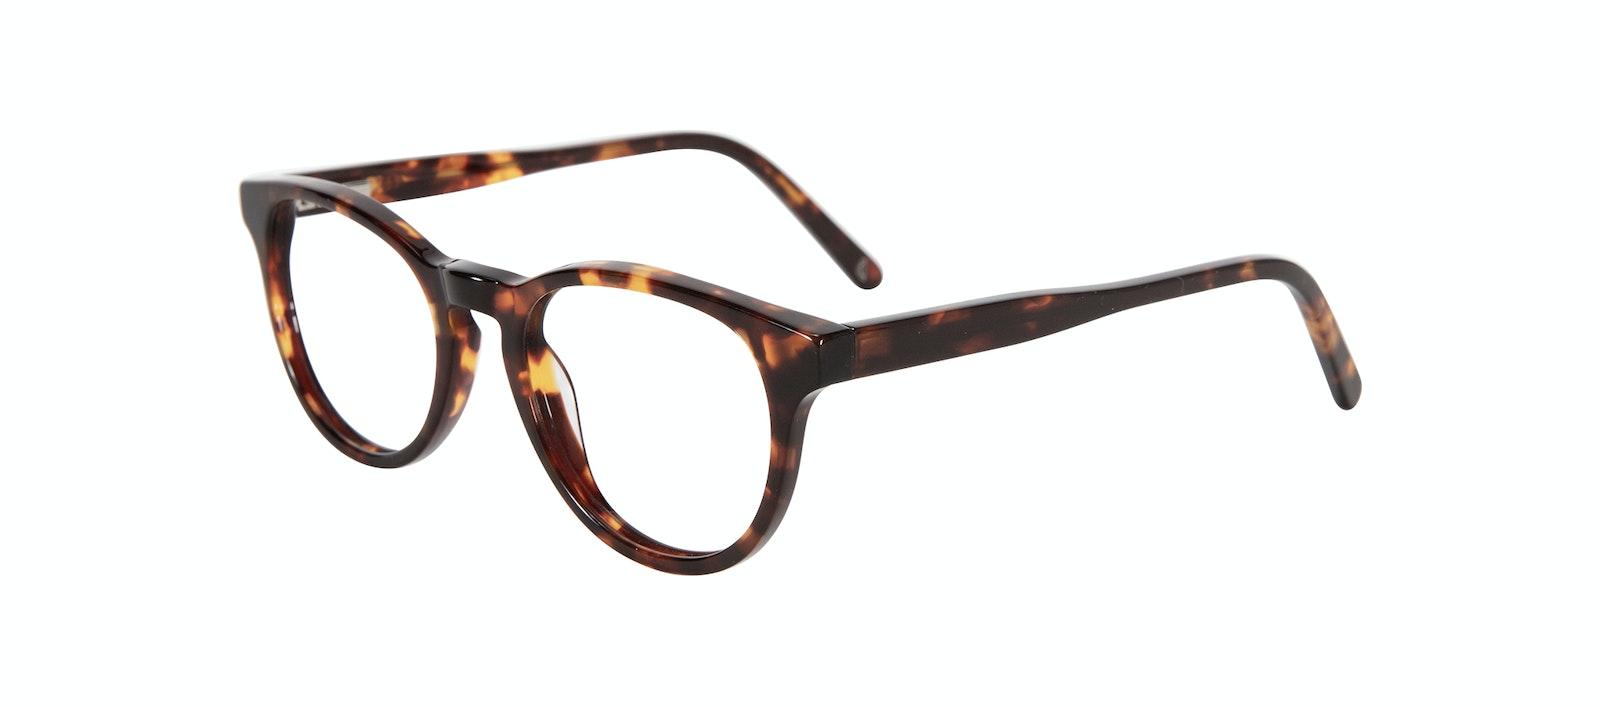 Affordable Fashion Glasses Round Eyeglasses Kids Cult Junior Sepia Kiss Tilt